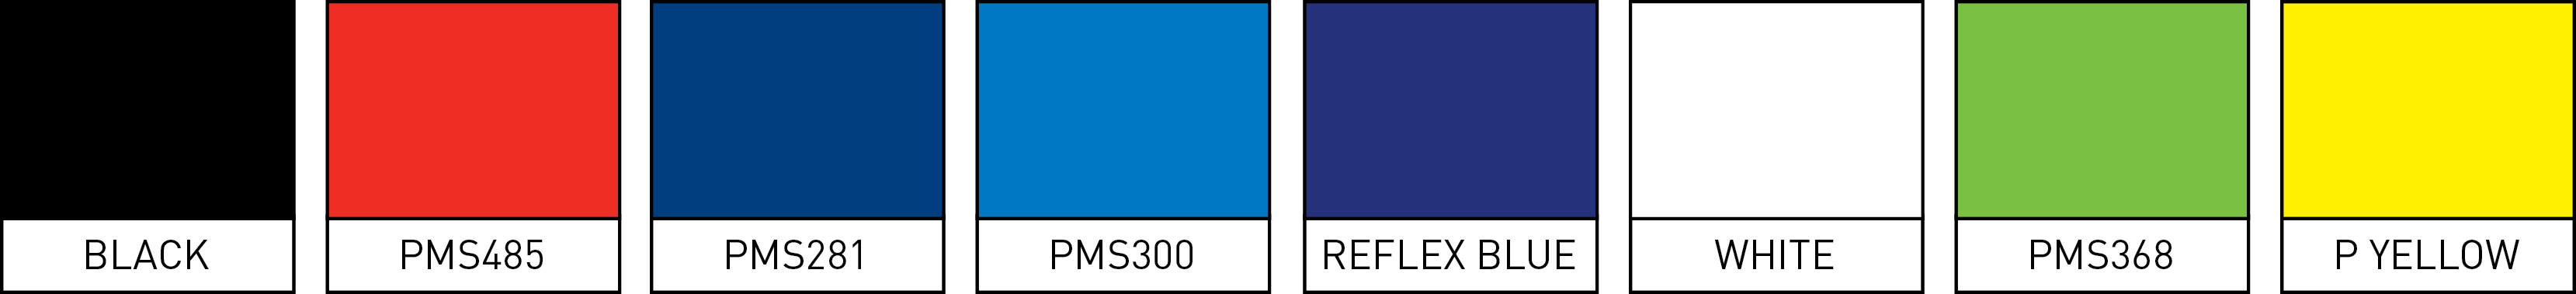 Nylon lanyard stock colors